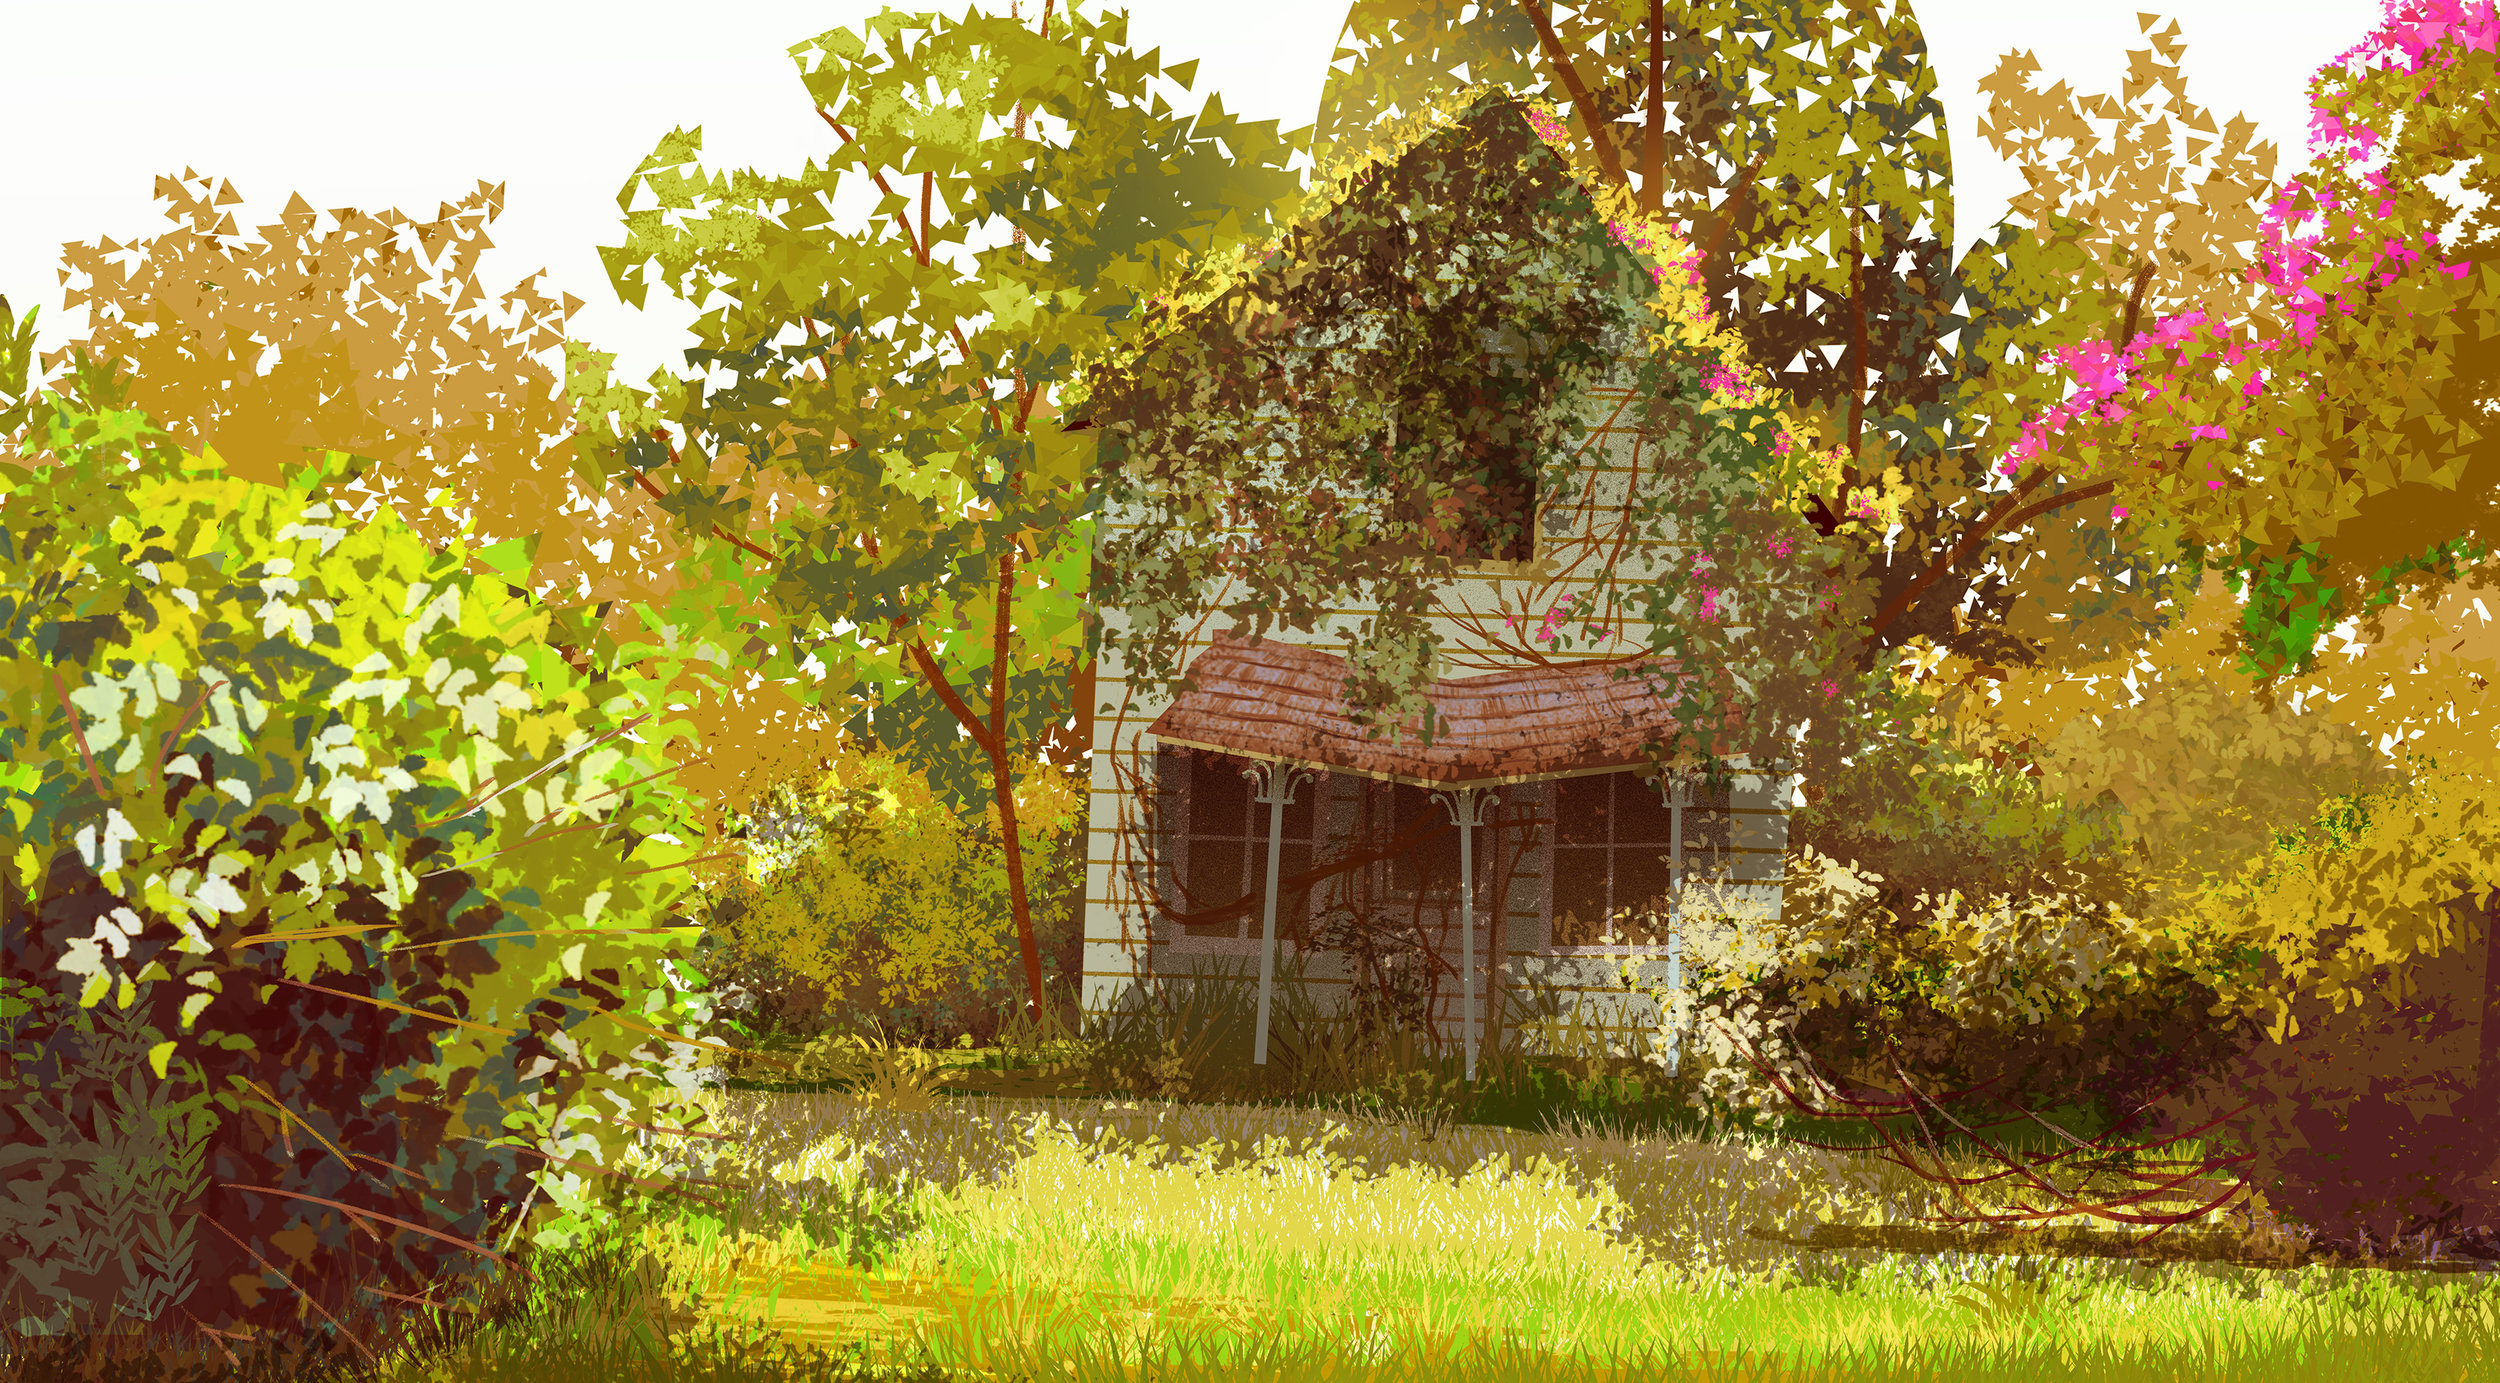 abandonedhouse1_11_small.jpg